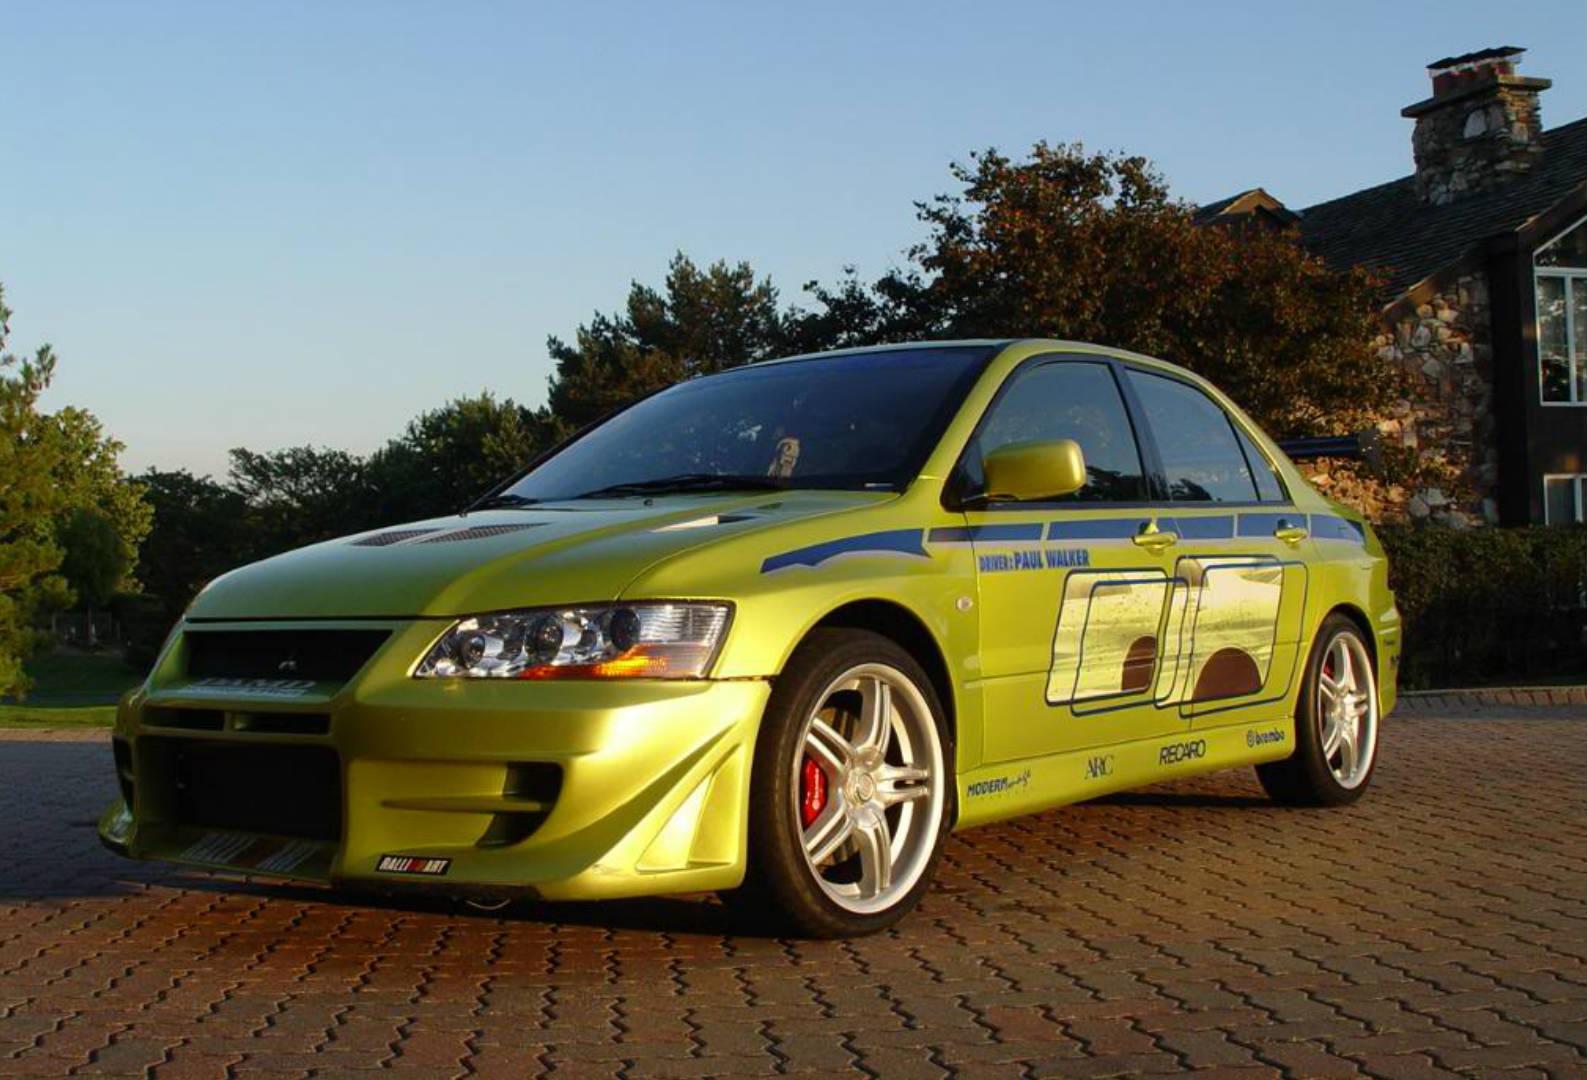 2 Fast 2 Furious Paul Walker's Mitsubishi Evo for Sale on eBay ...